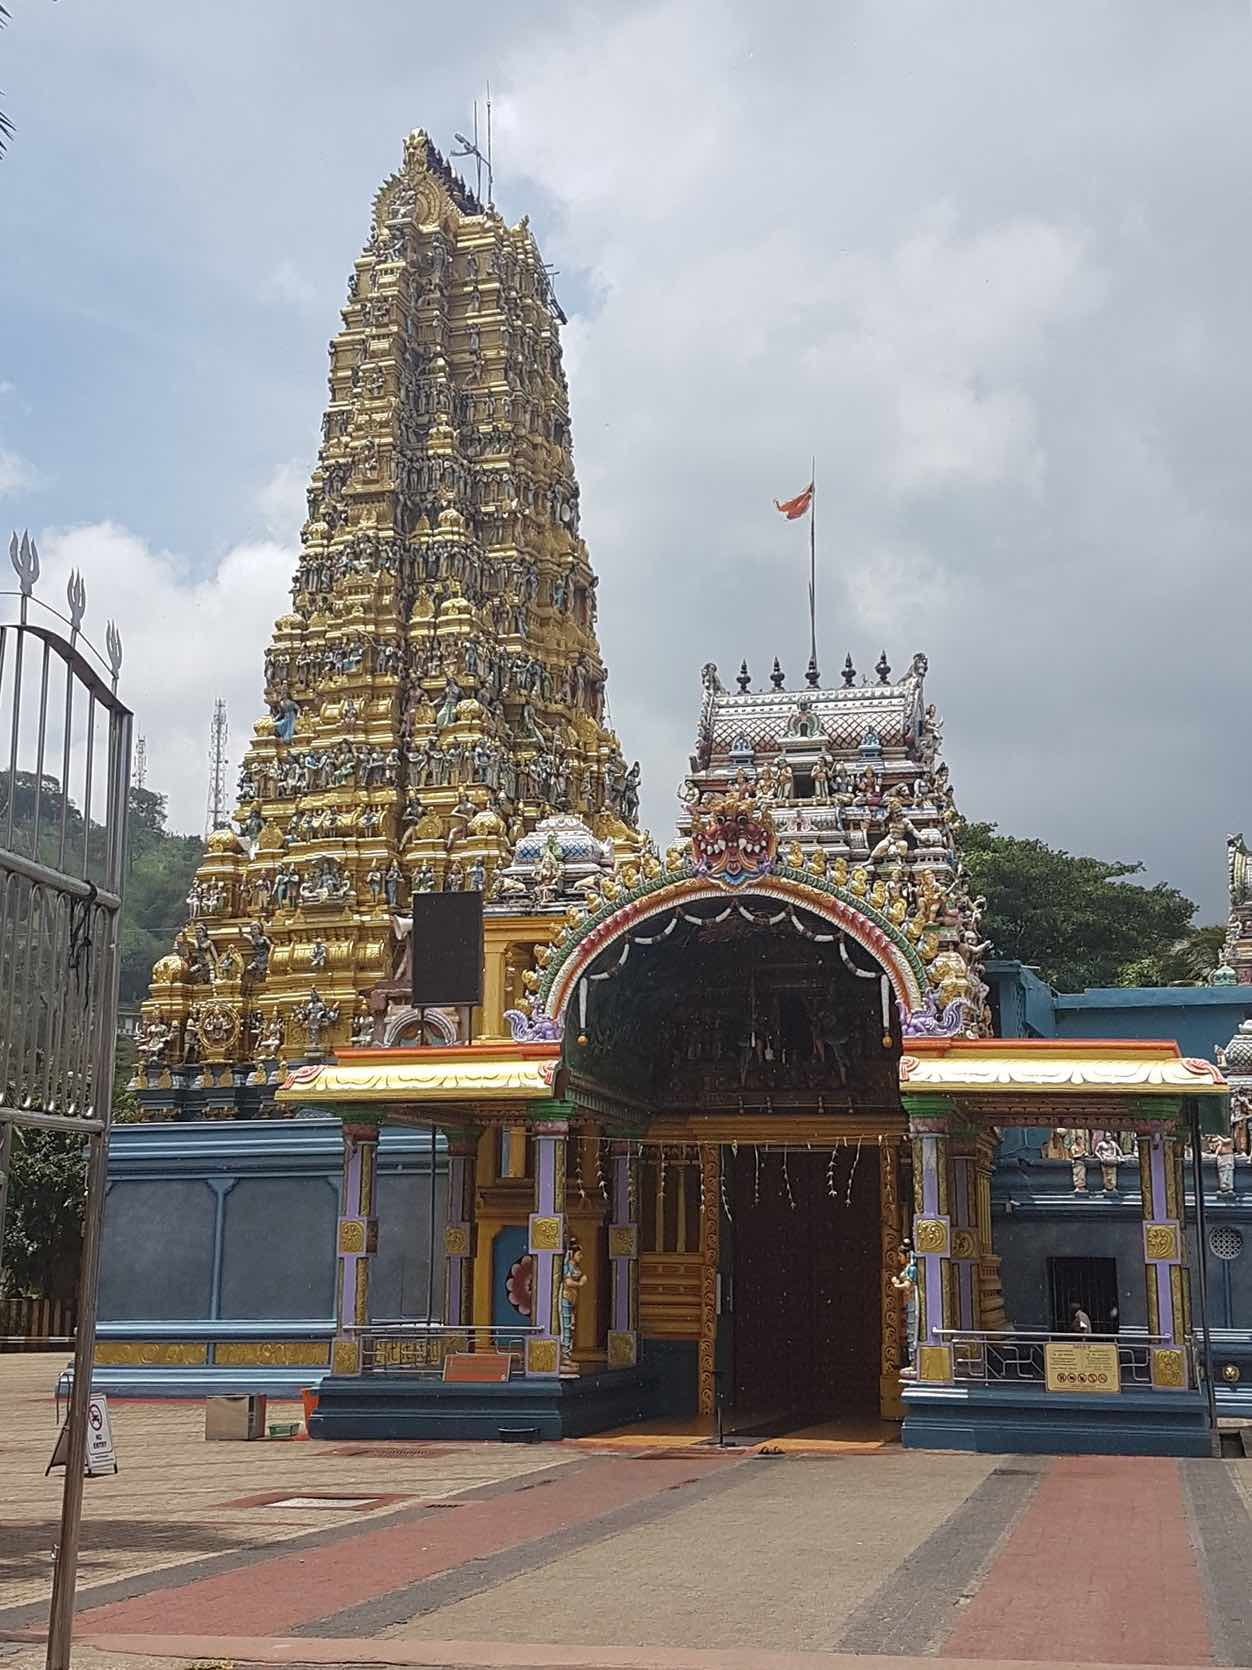 sri-lanka-tamil-temple-holiday-review-feedback-invite-to-paradise-quentin-kate-hulm.jpg